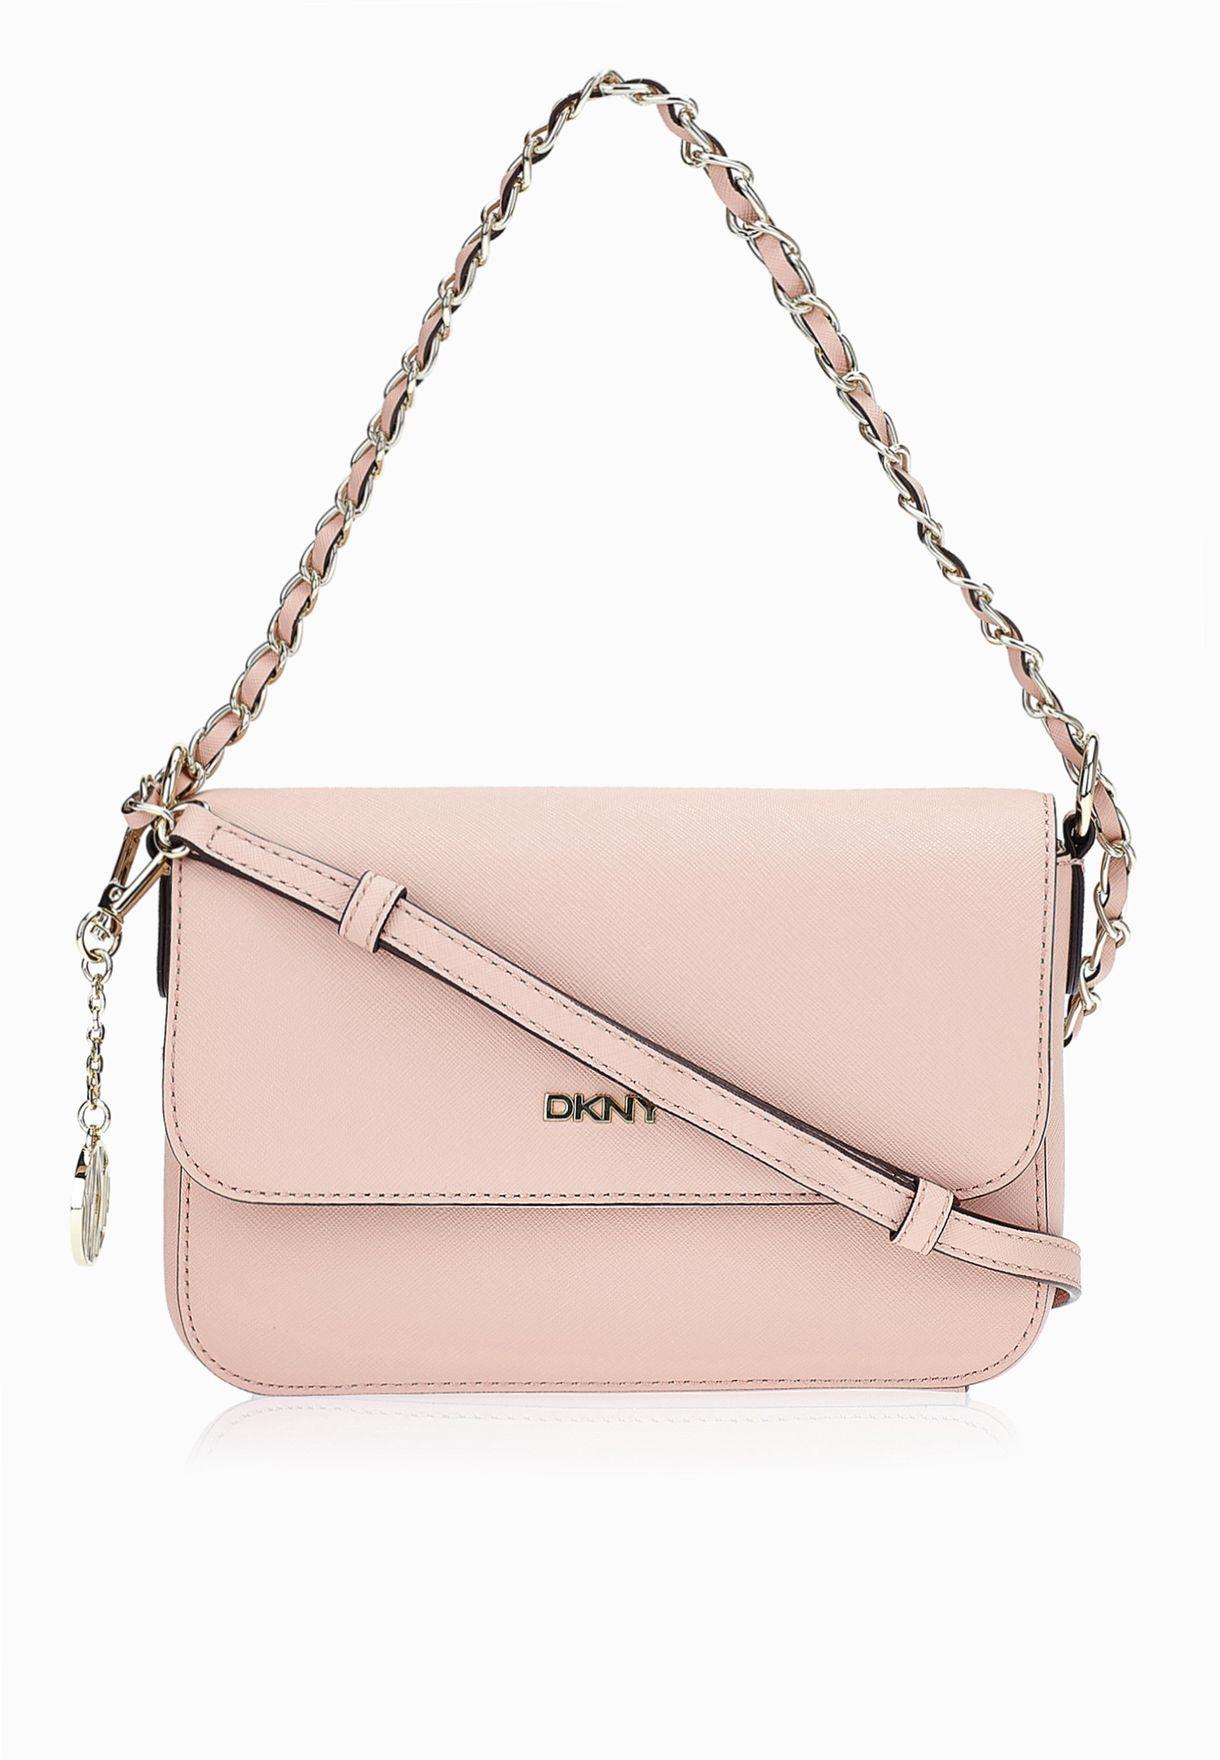 82adcbec2 تسوق حقيبة صغيرة بحمالة طويلة ماركة دكني لون وردي R3513004 في ...